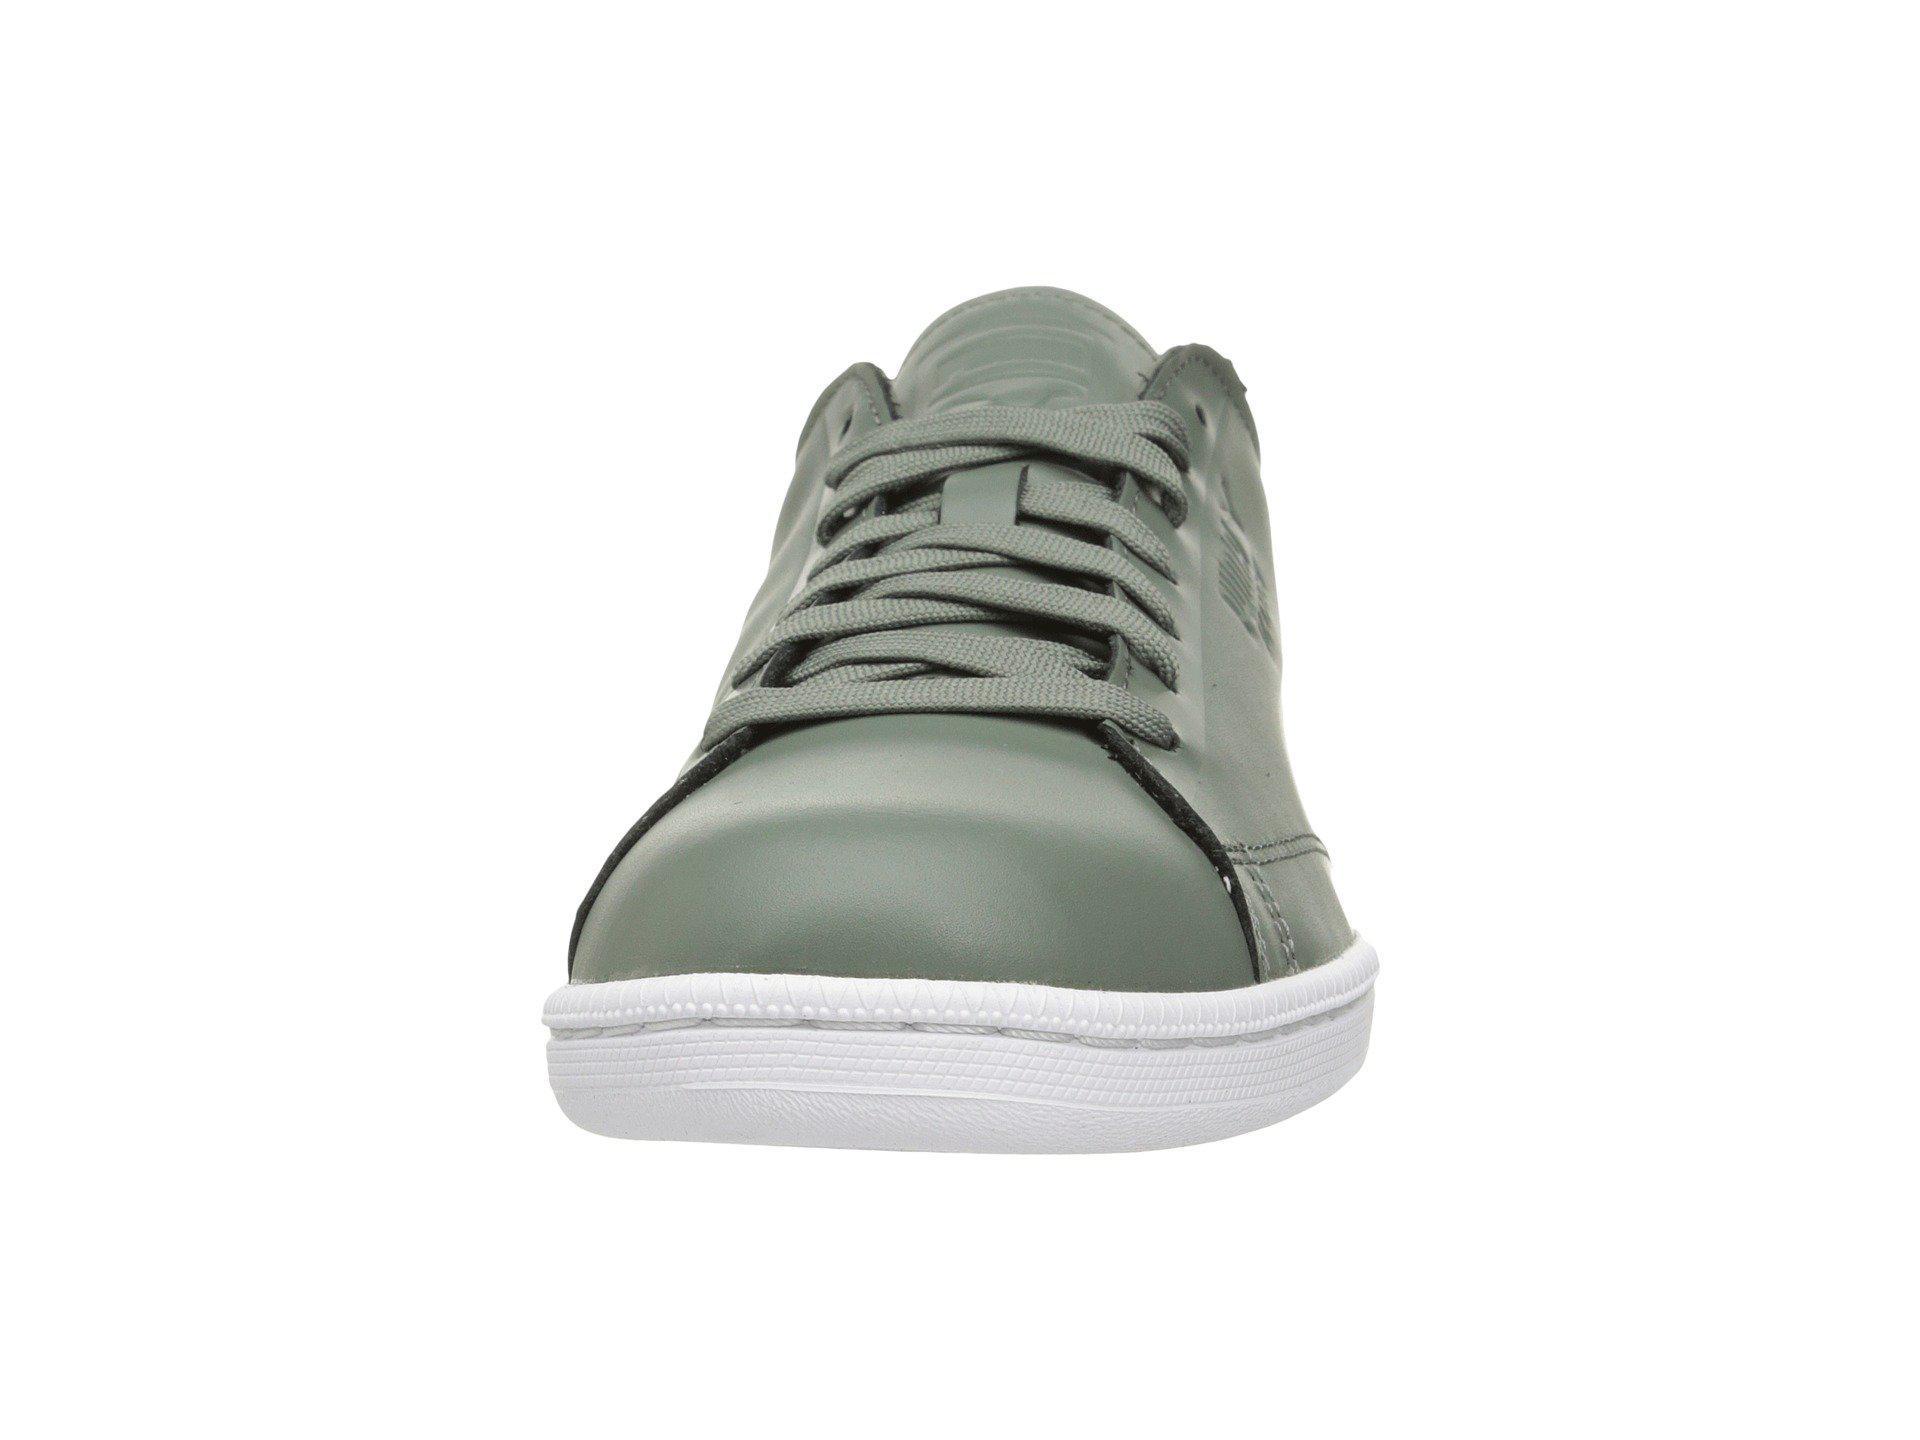 402d56d15ad PUMA - Green Match Clean for Men - Lyst. View fullscreen